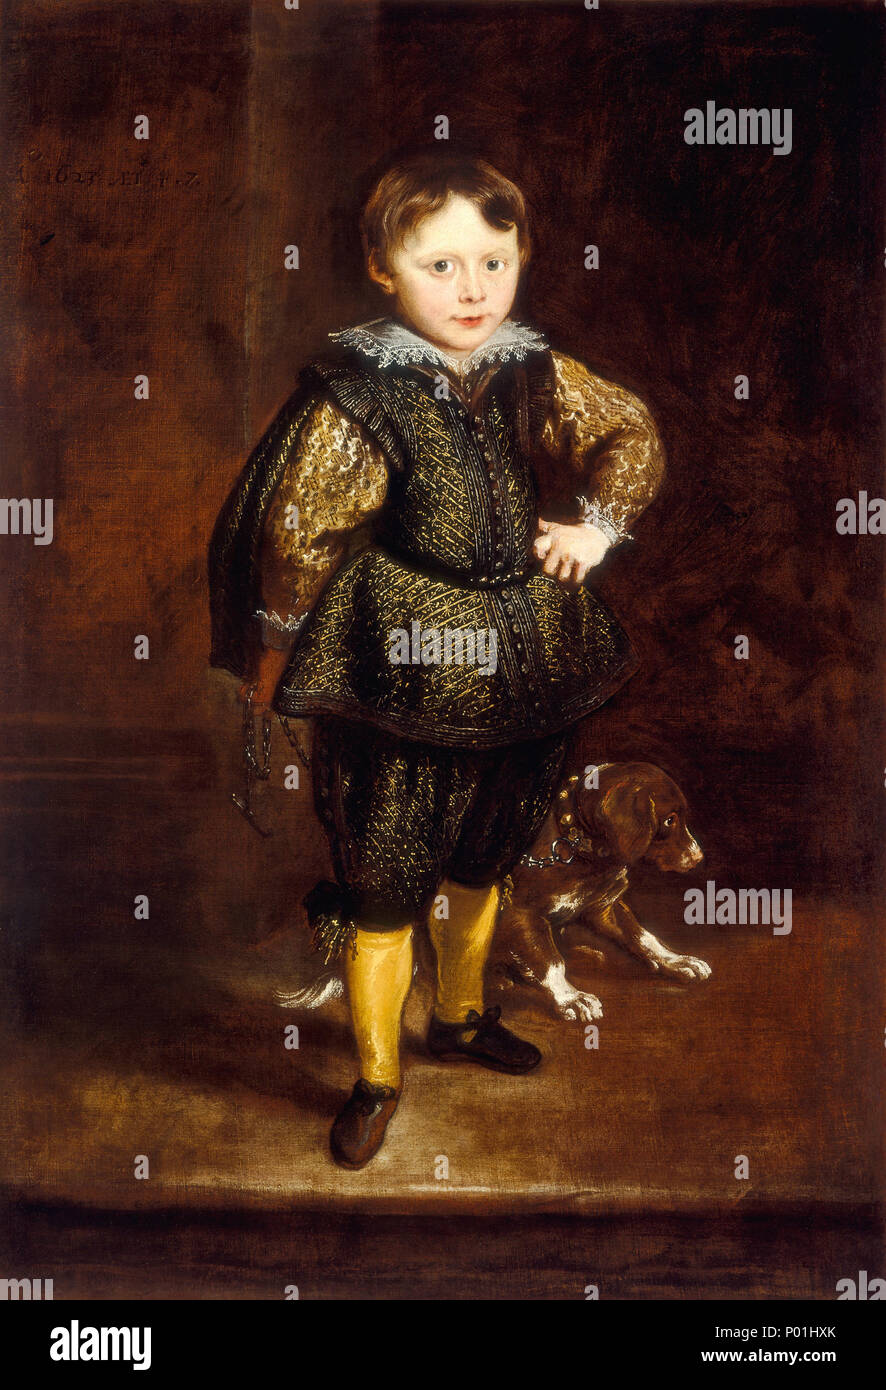 Pintura; óleo sobre lienzo; total: 122,5 x 84,1 cm (48 1/4 x 33 1/8 pulg.), enmarcado: 161,6 x 123,8 cm (63 5/8 x 48 3/4 pulg.); 9 Filippo Cattaneo SC-000394 Foto de stock